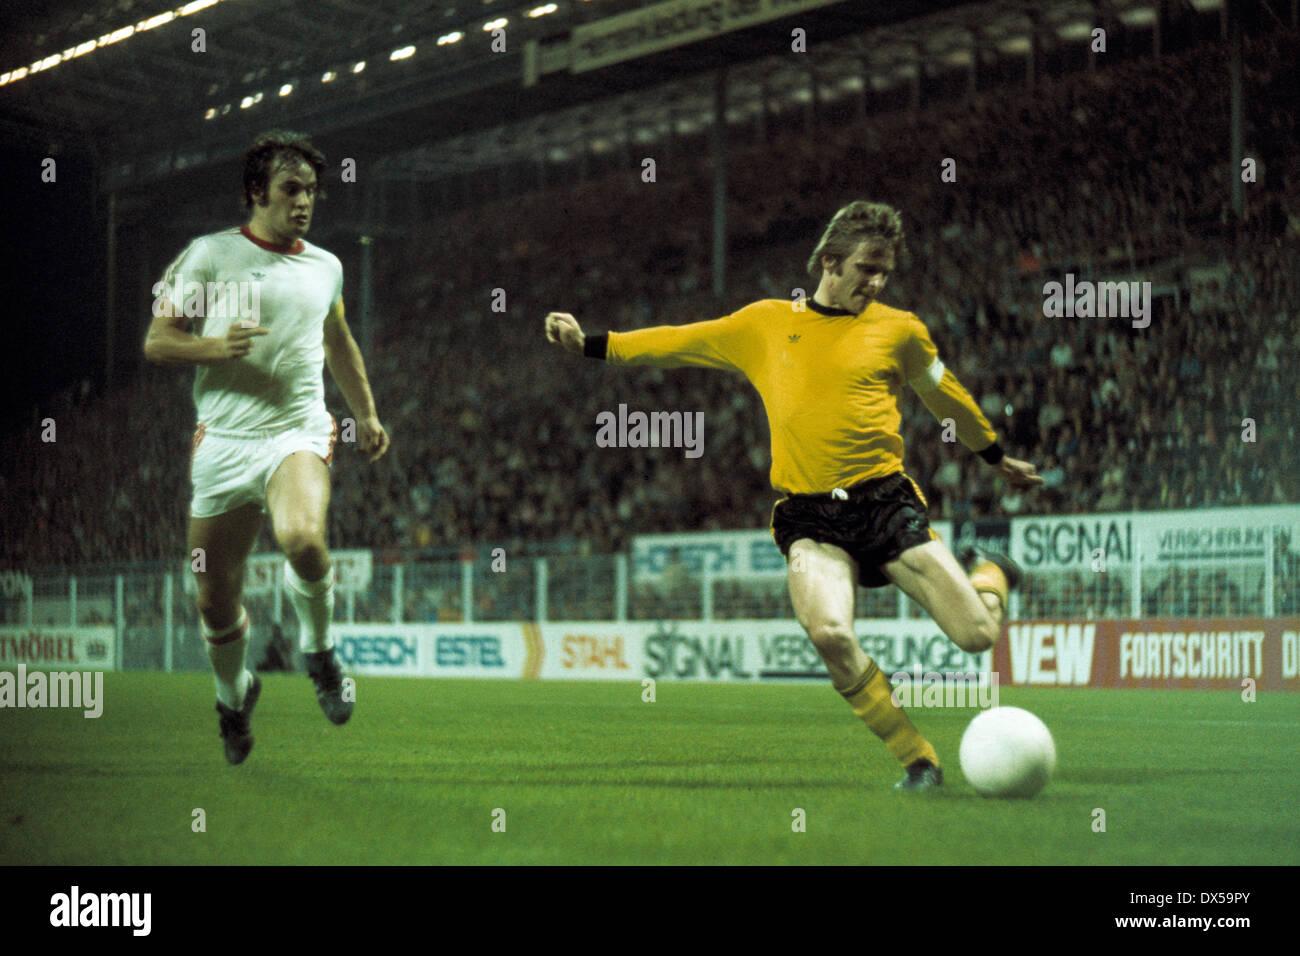 football, 2. Bundesliga Nord, 1974/1975, Westfalen Stadium, Borussia Dortmund versus Rot Weiss Oberhausen 4:0, scene of the match, left Paul Scheermann (RWO), right Klaus Ackermann (BVB) - Stock Image